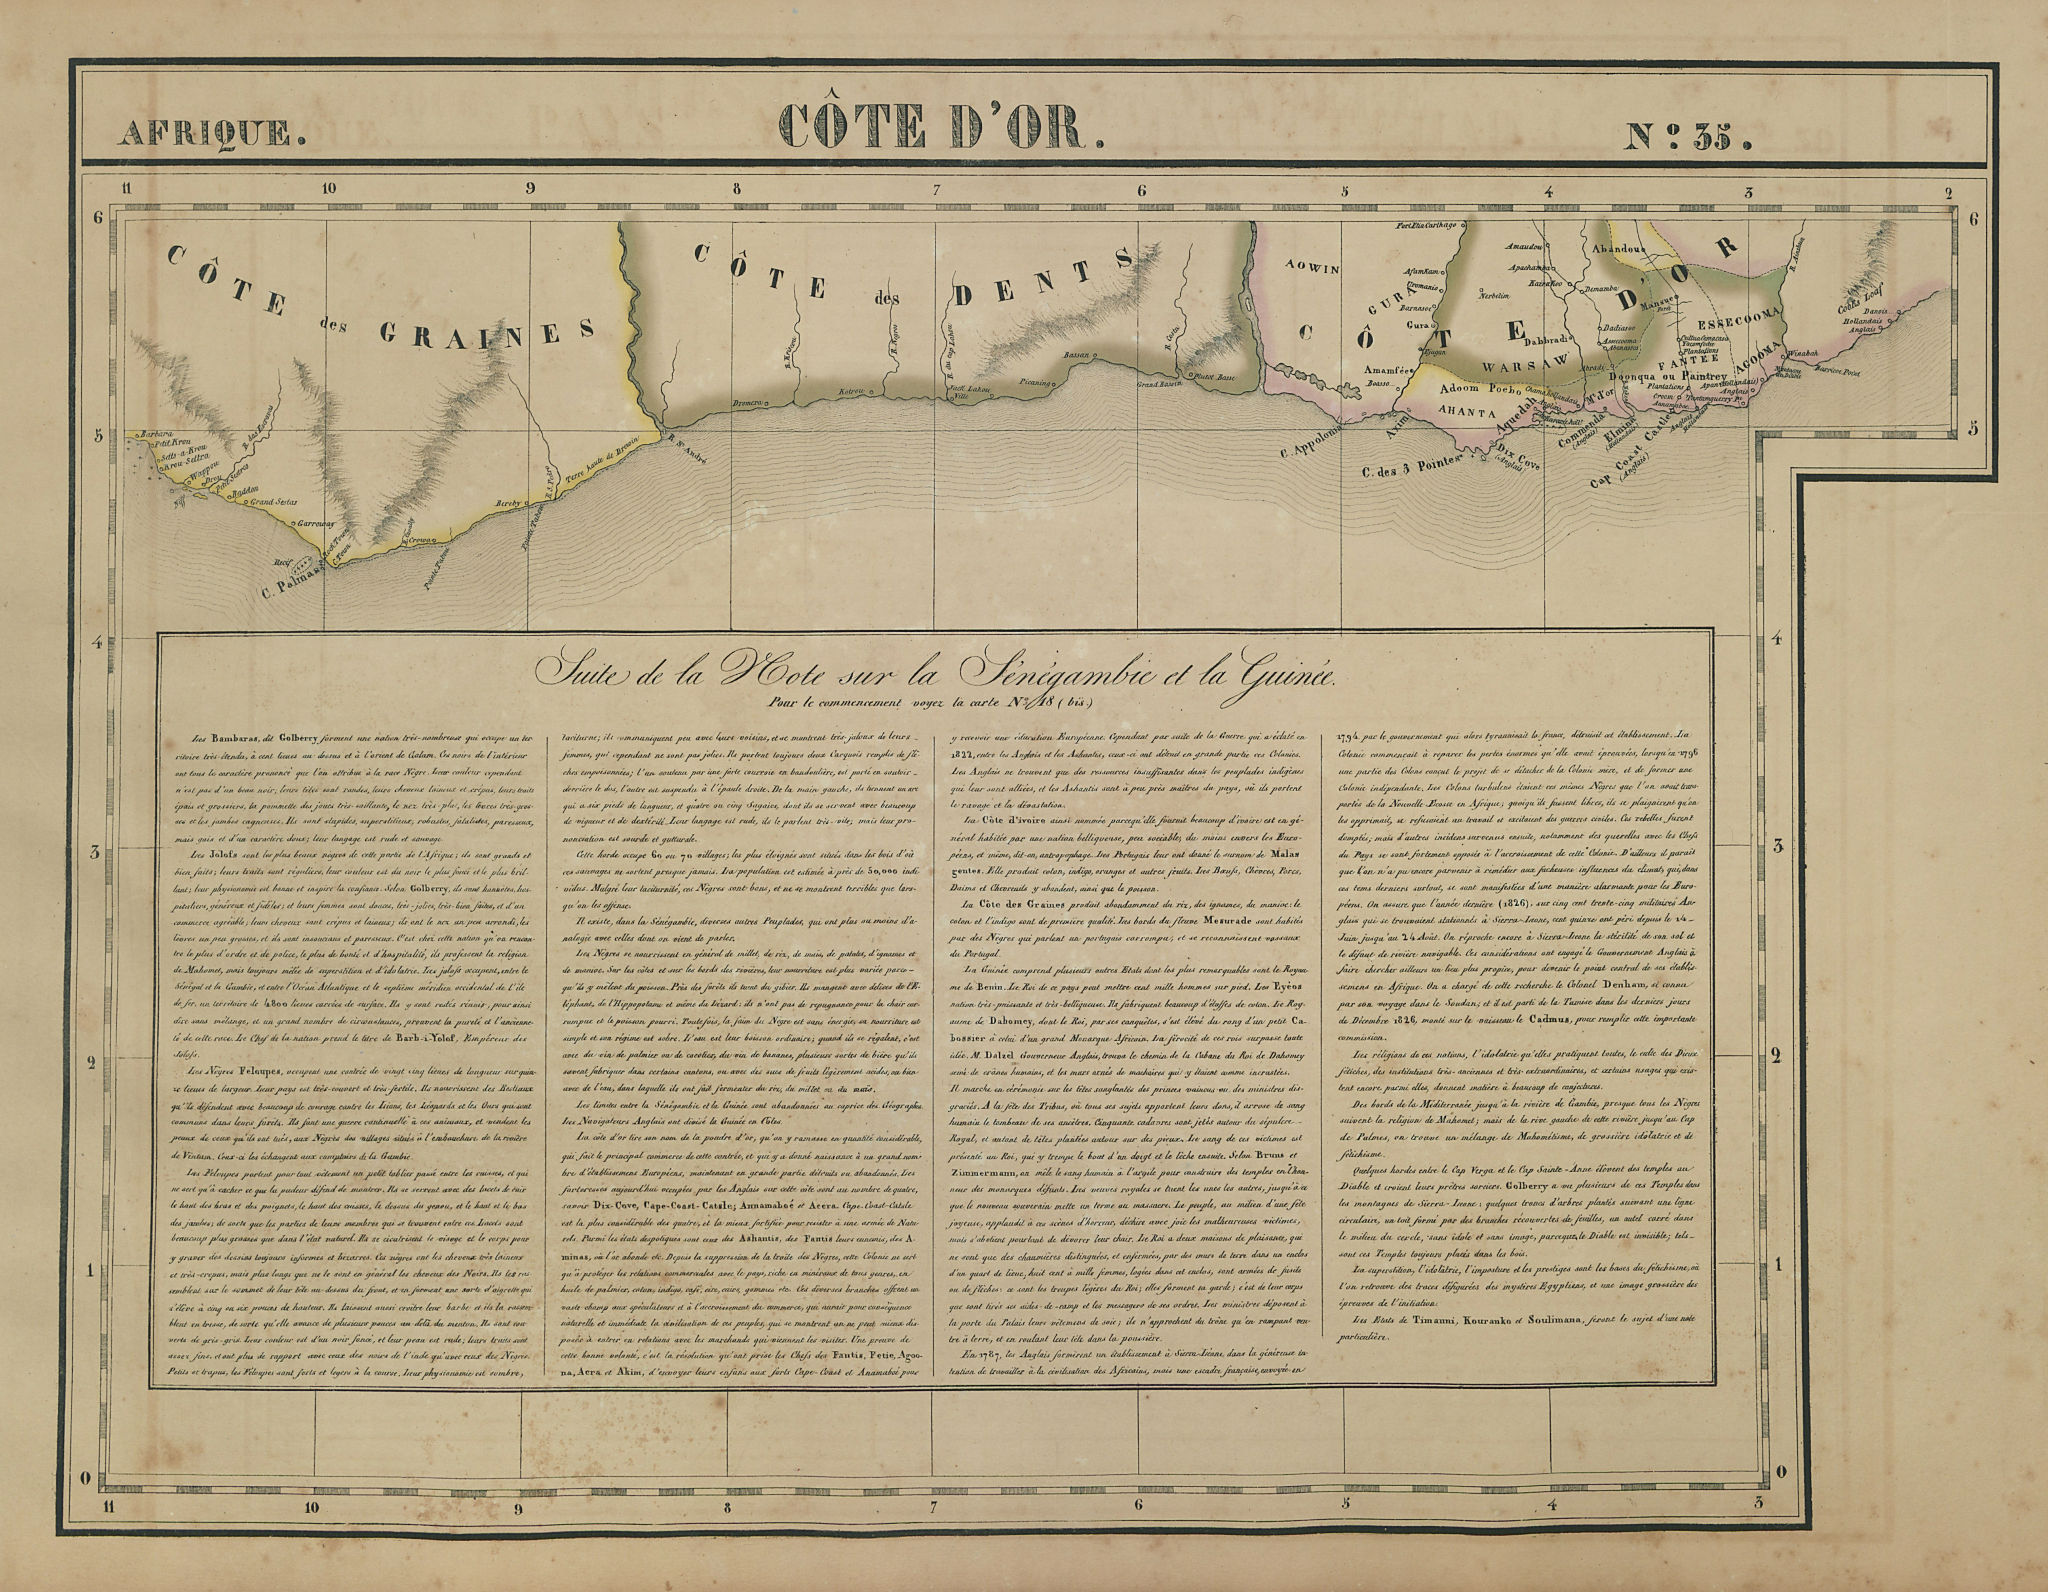 Afrique. Côte d'Or 35 Ivory Coast, Ghana & eastern Liberia VANDERMAELEN 1827 map